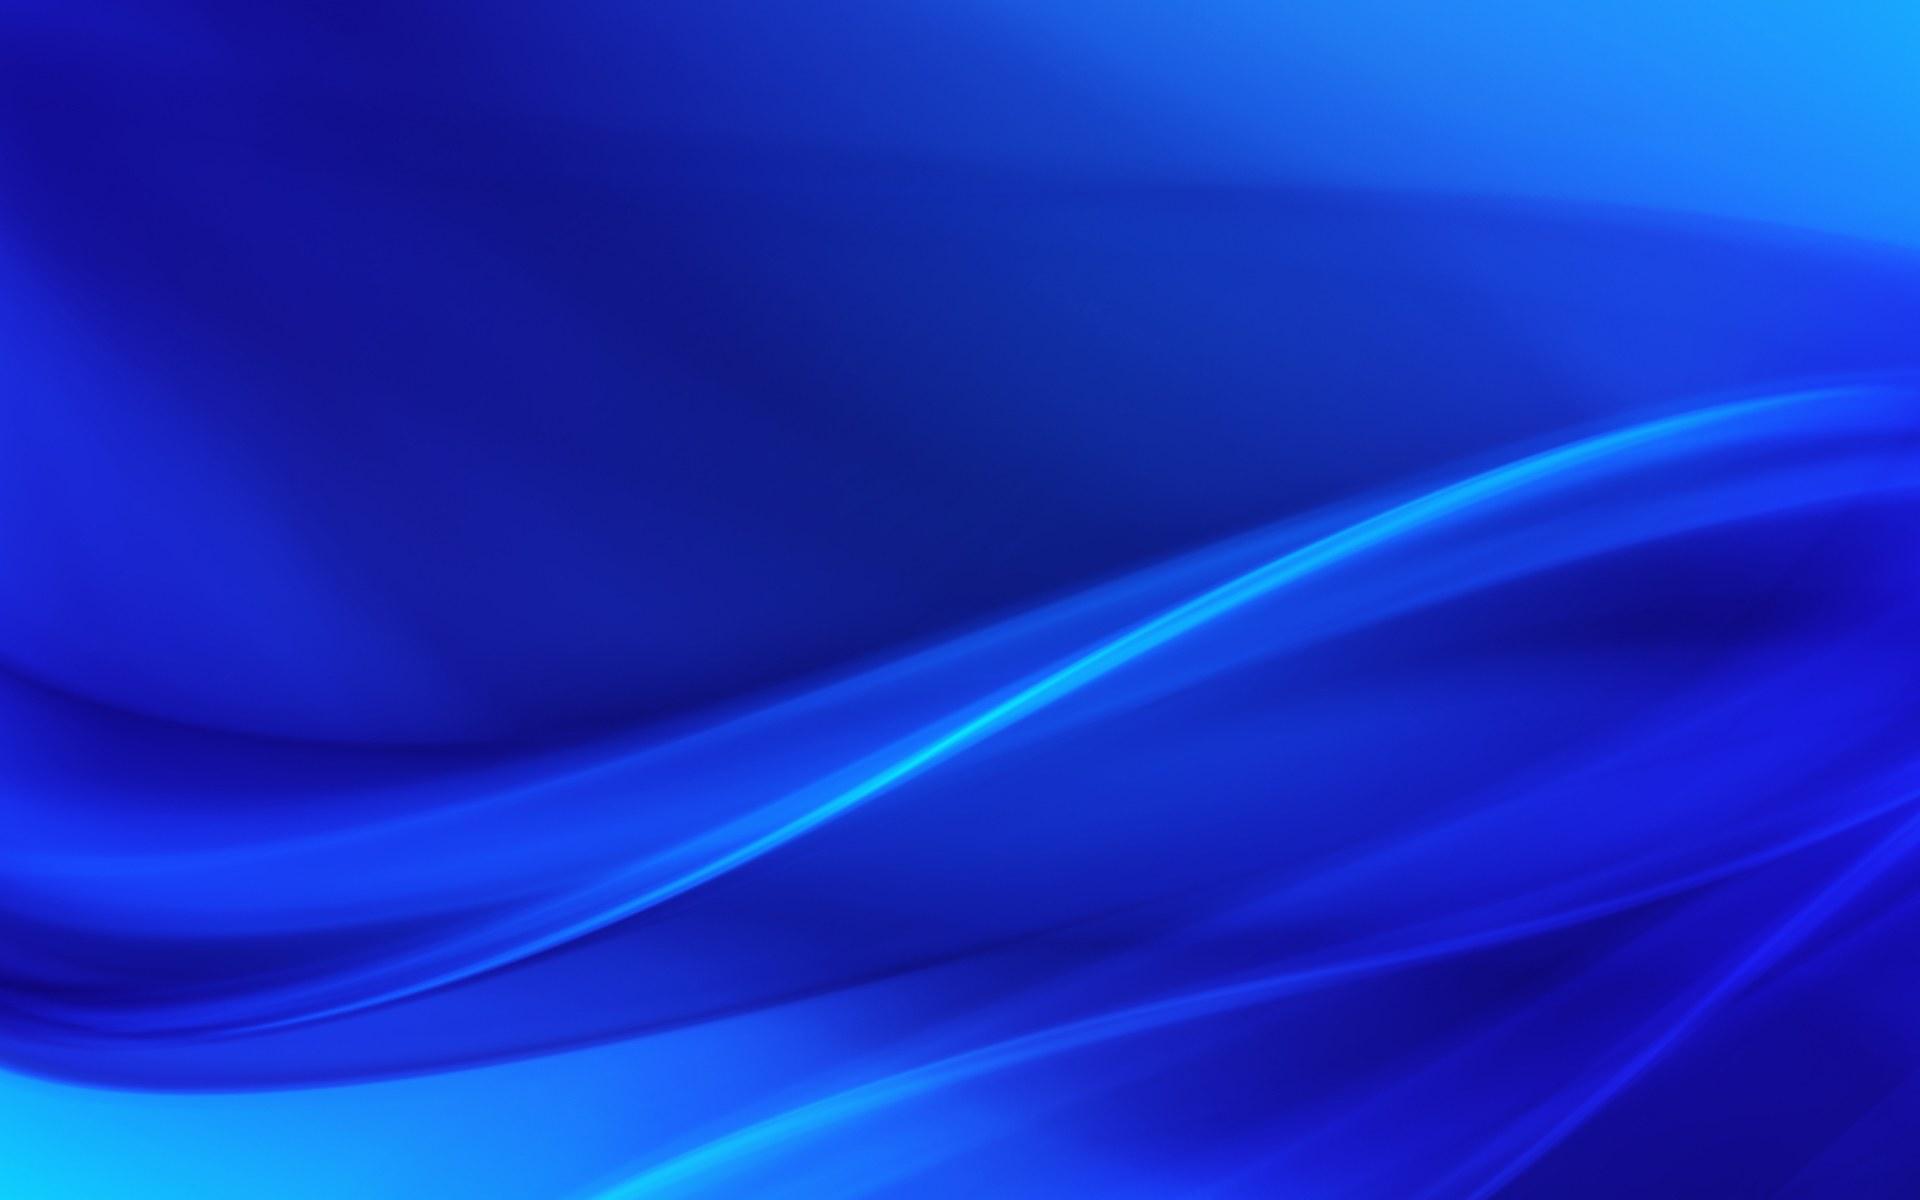 Blue Background   Blue Abstract Light Effect 19201200 NO28 Wallpaper 1920x1200